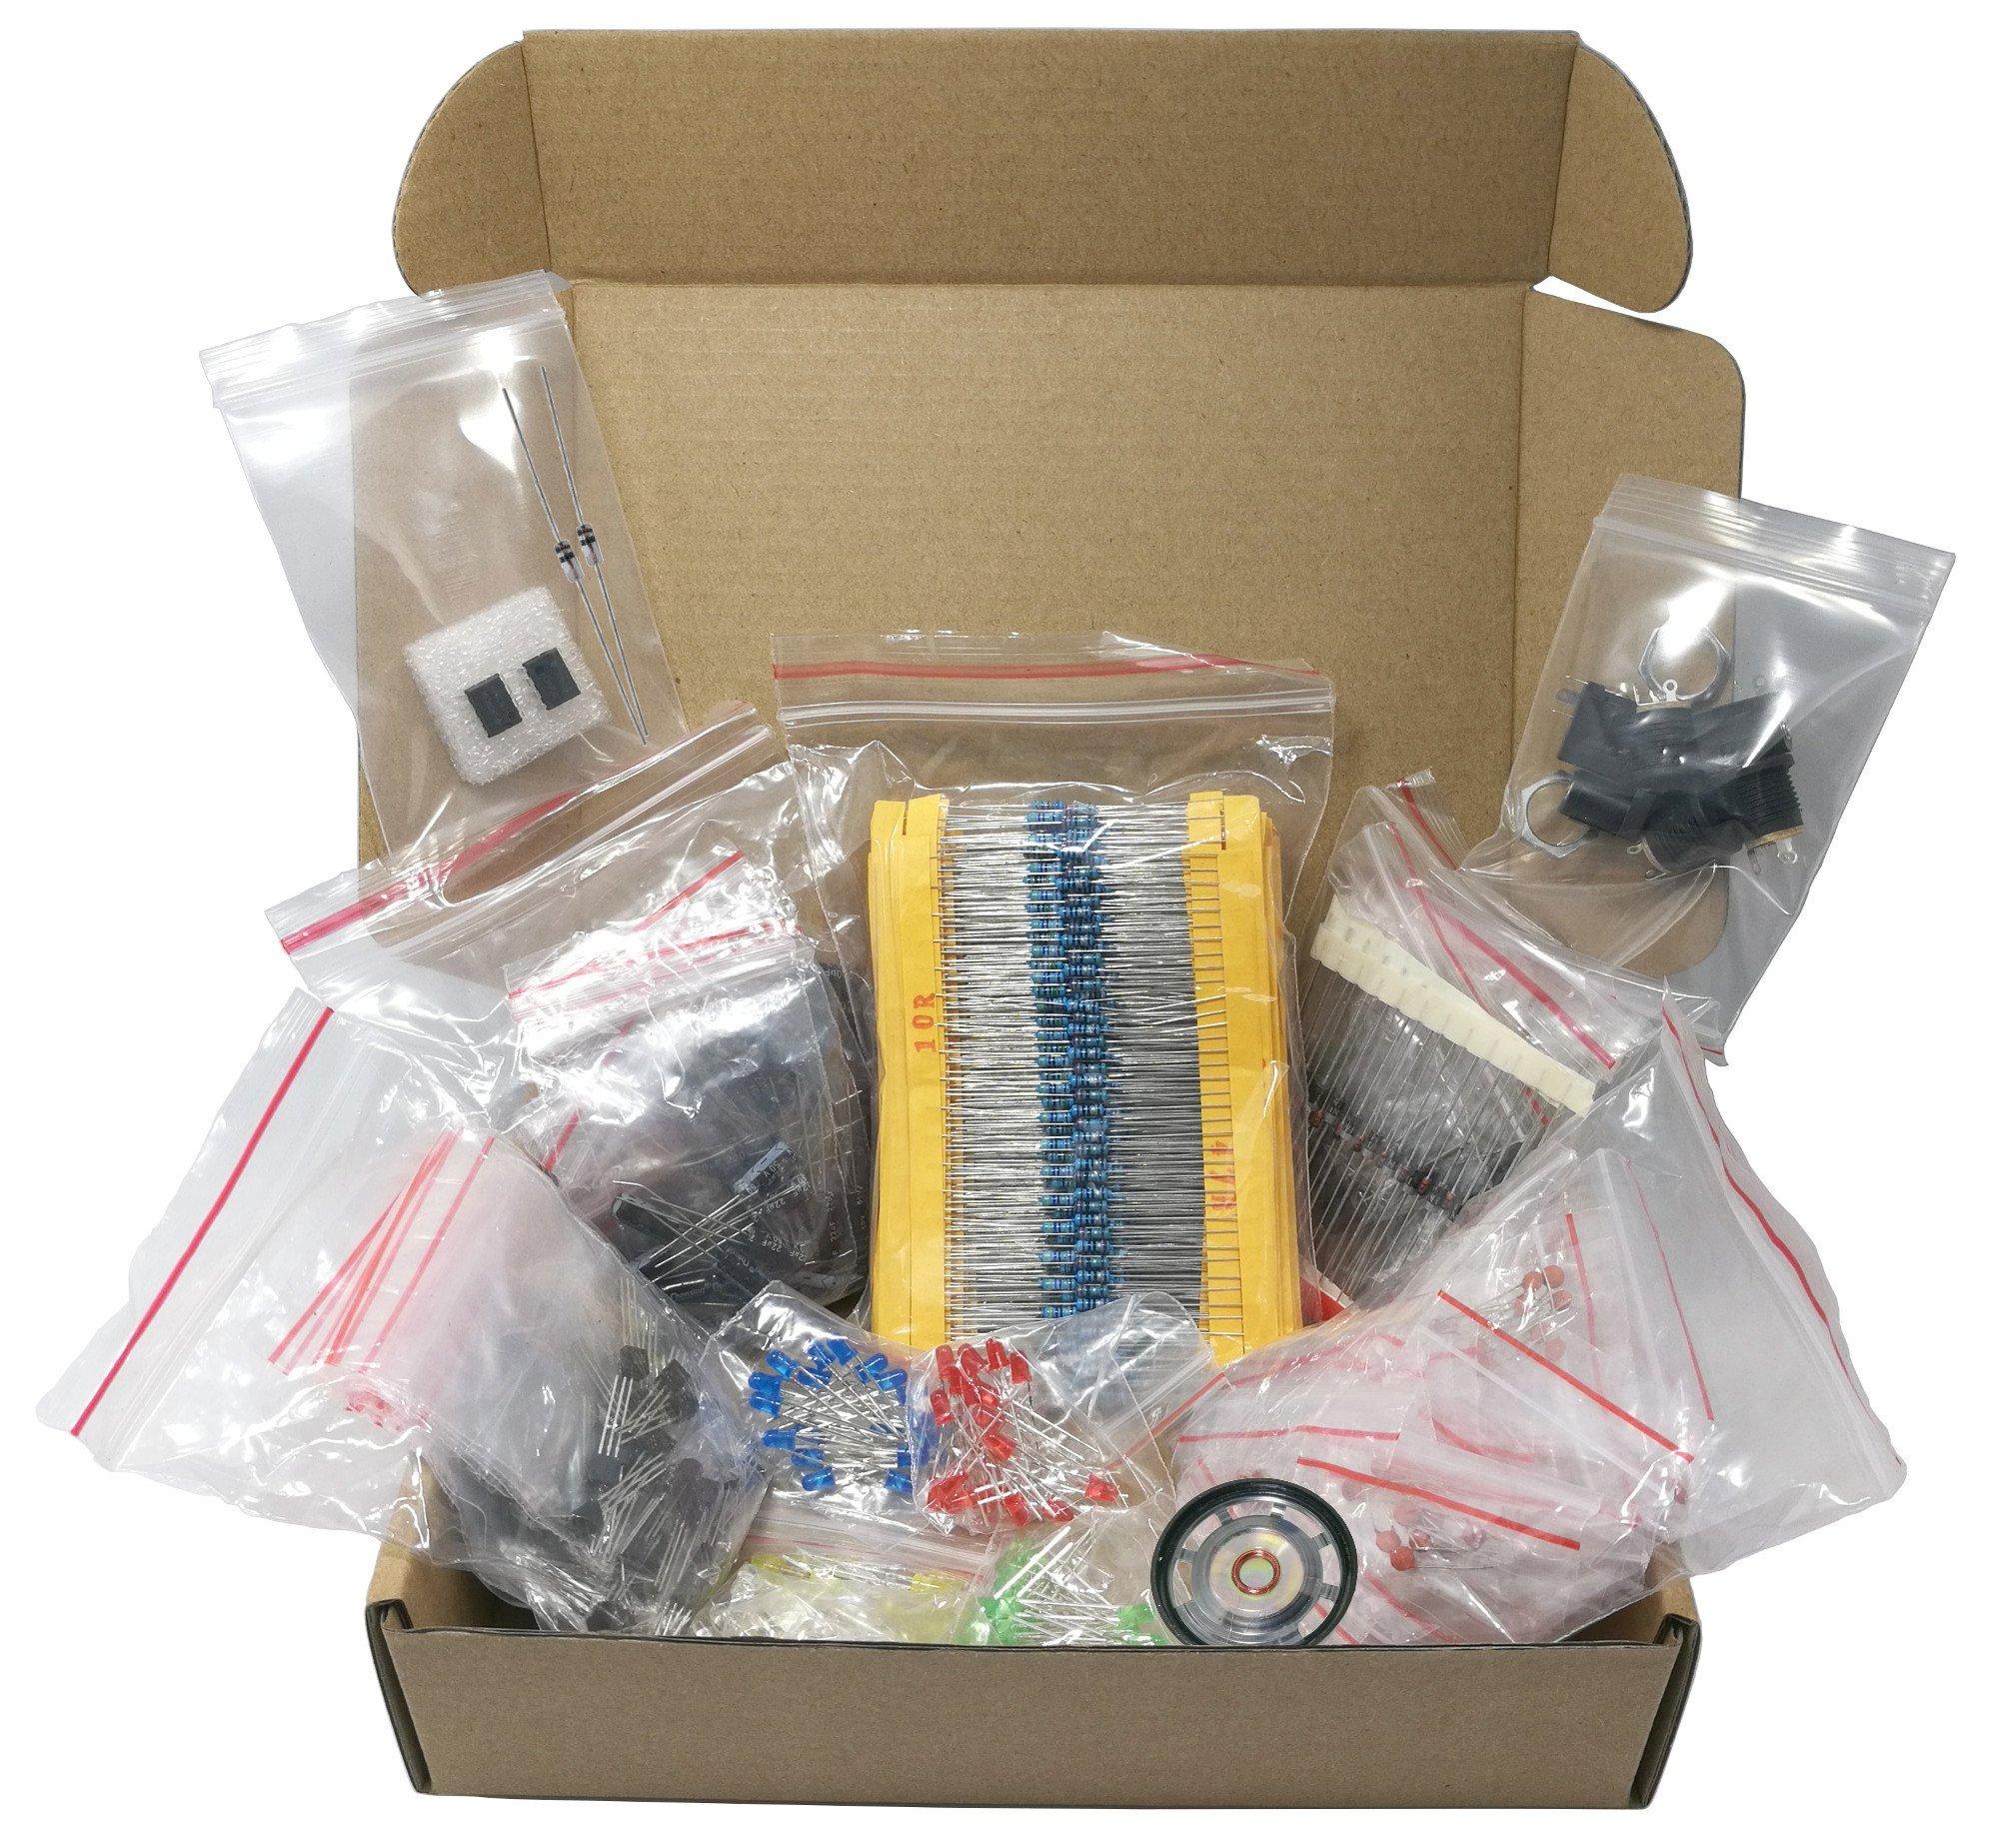 Mega Electronic Component Kit Assortment, Capacitors, Resistors, LED, Transistors, Diodes, 1n270 Germanium, DC jacks, opamp, pcb, speaker, 1406 pcs